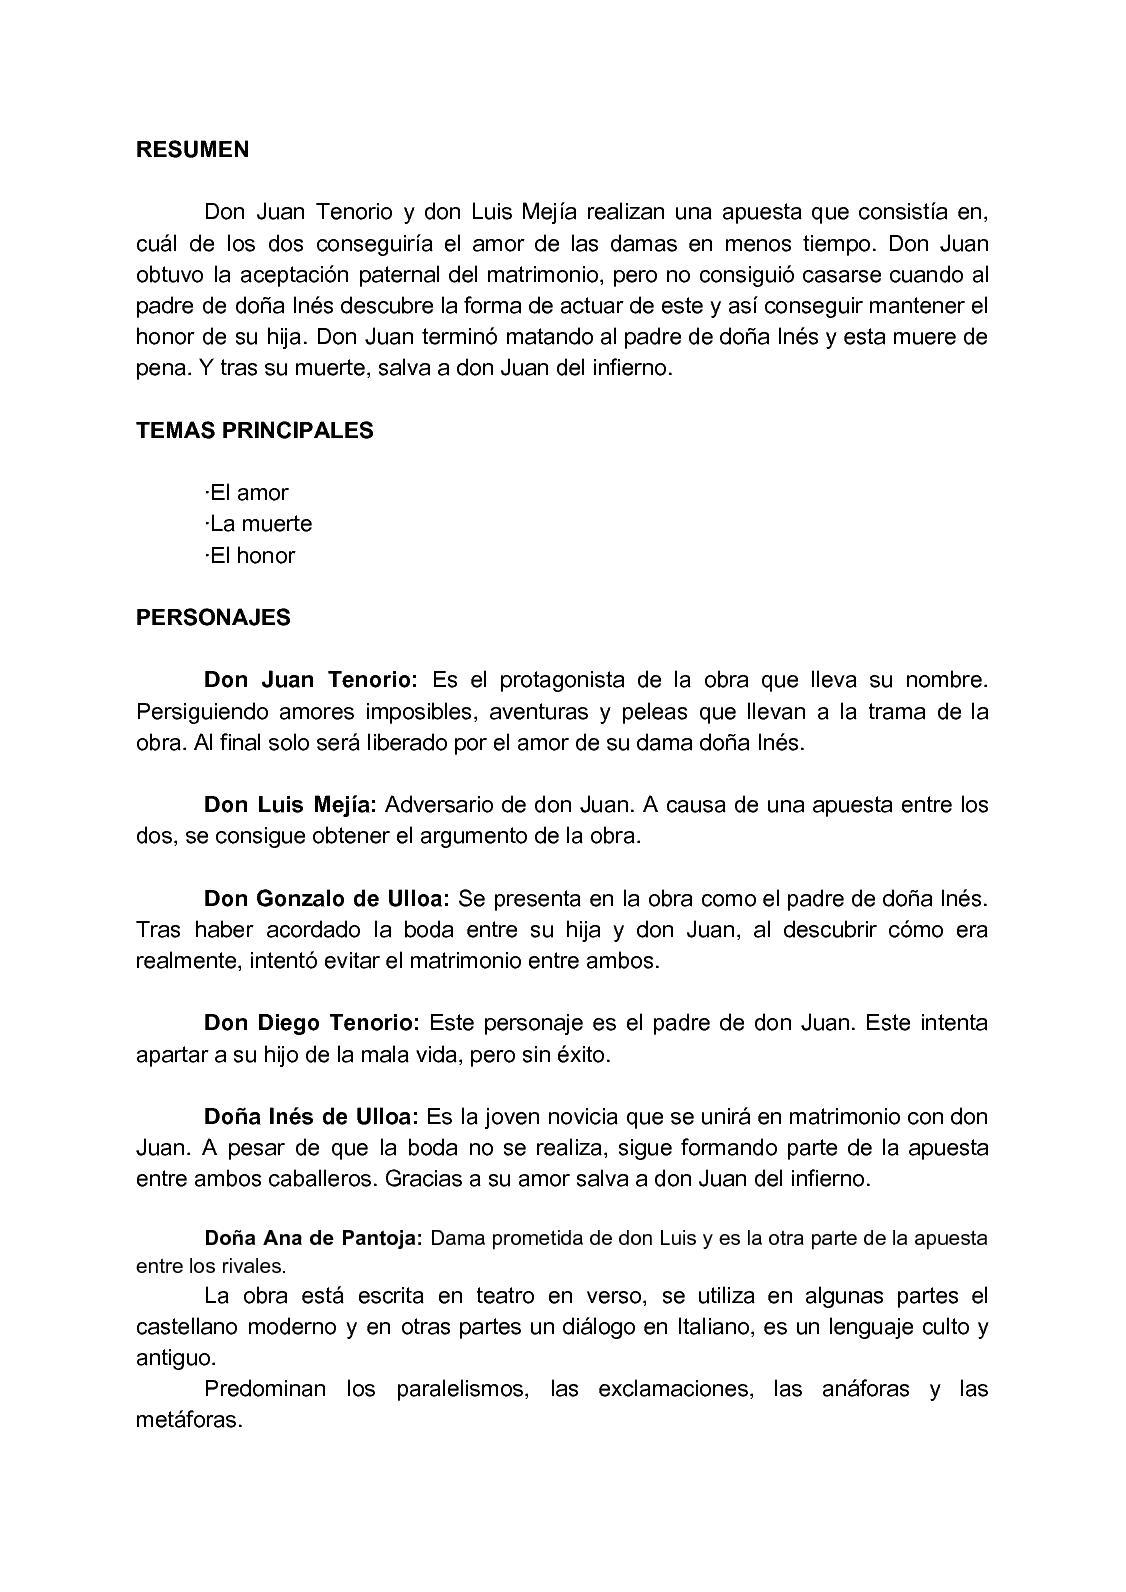 Resume de don juan tenorio jstor collected essays